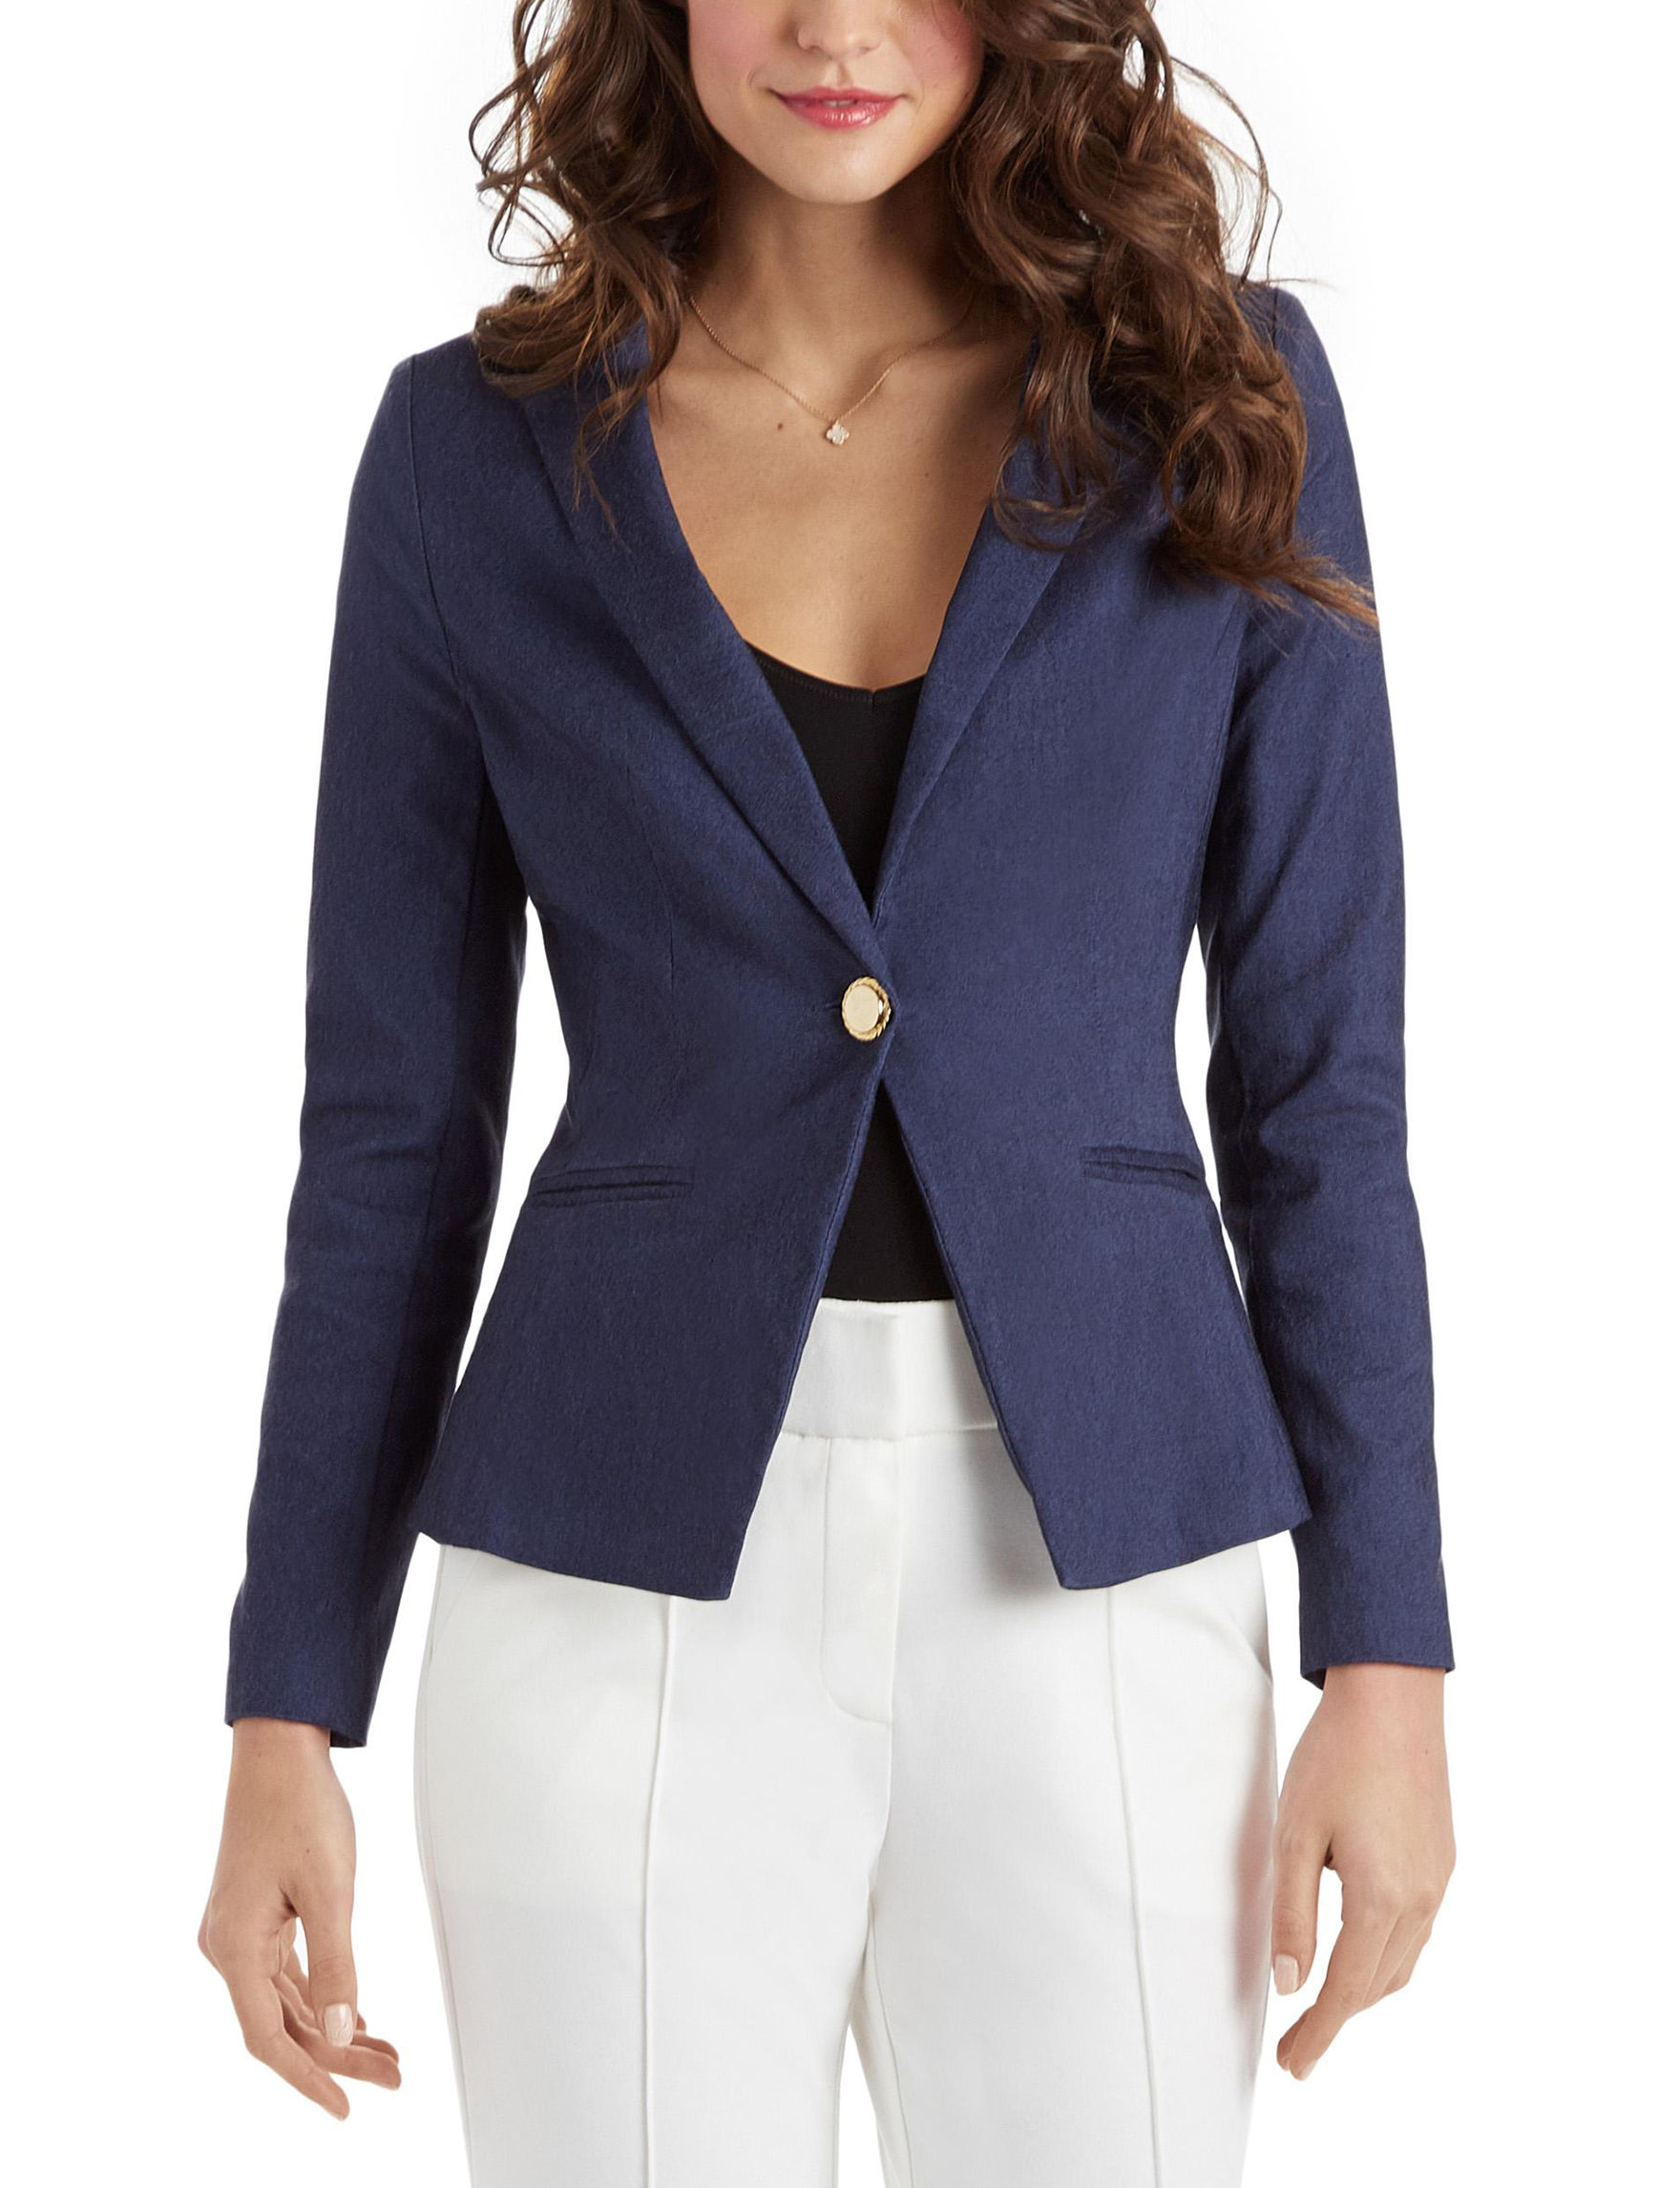 XOXO Medium Blue Lightweight Jackets & Blazers